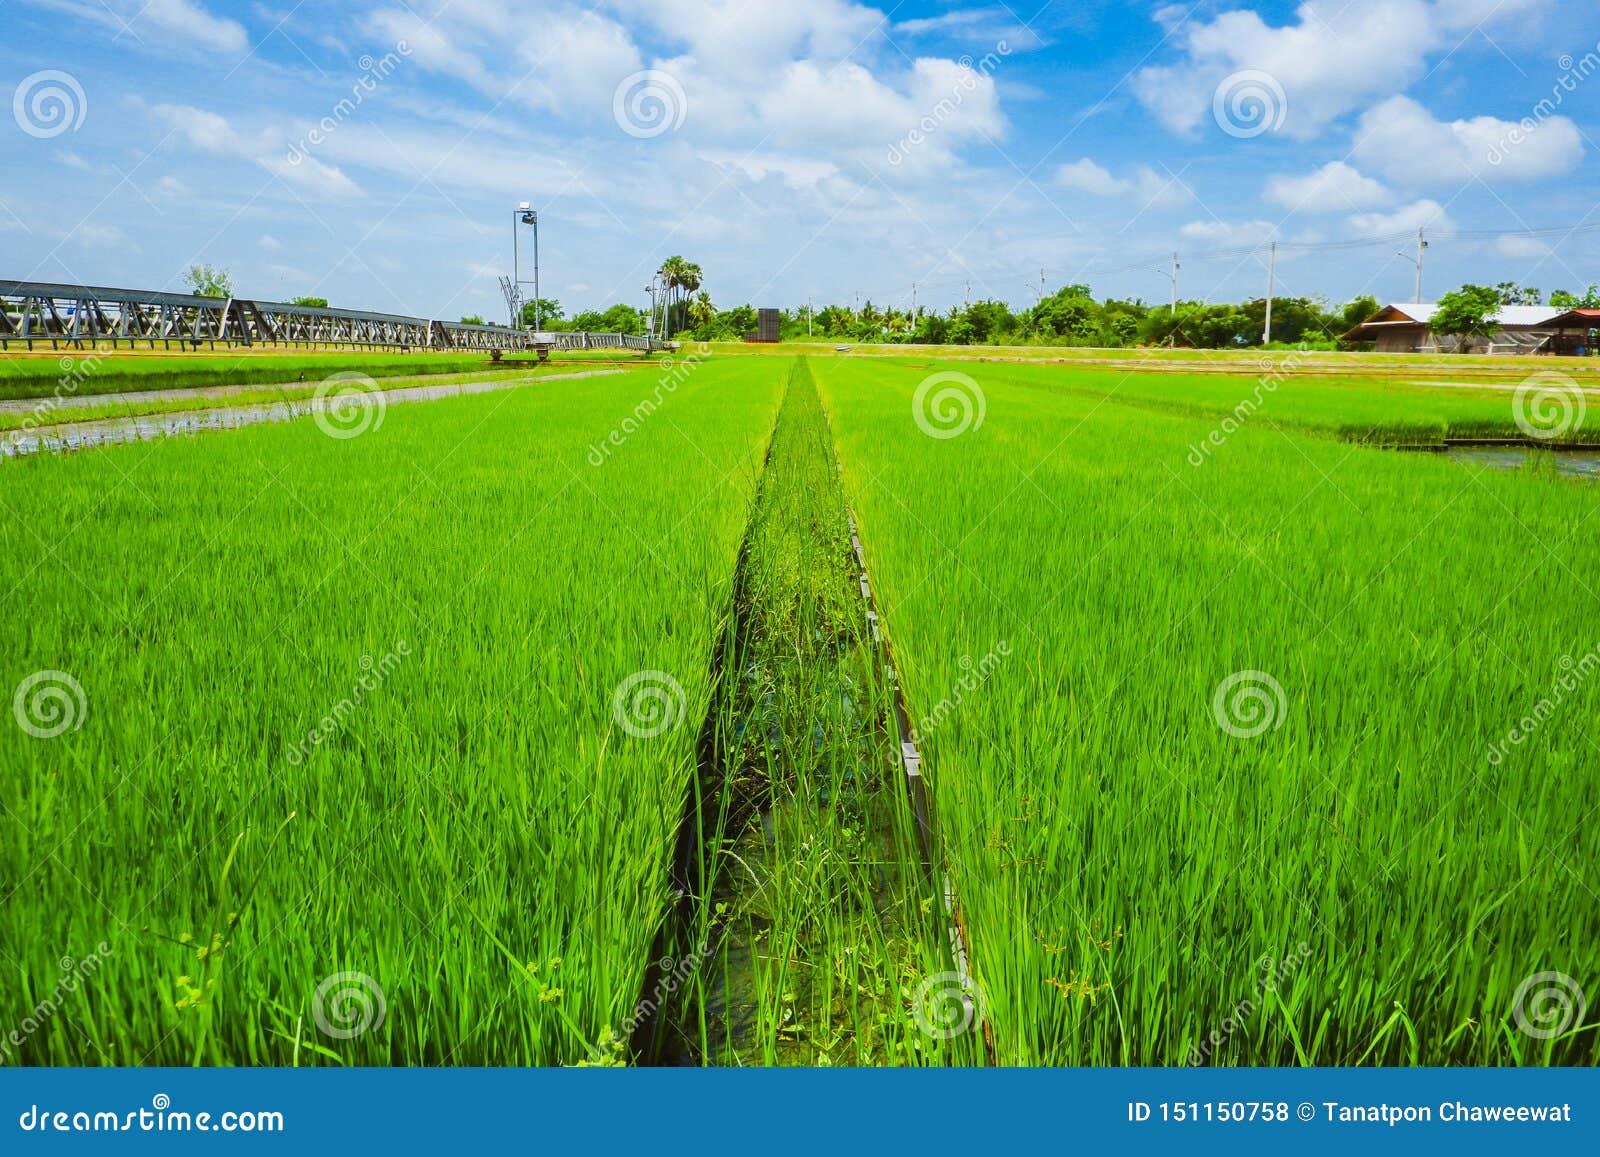 Aziatische Thaise padievelden met blauwe hemel backgorund